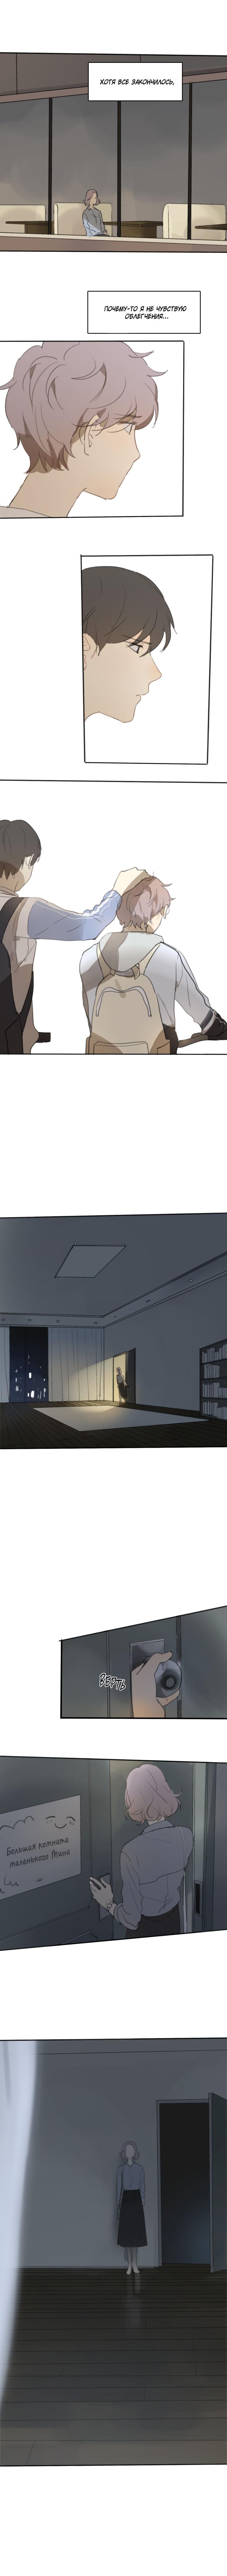 https://r1.ninemanga.com/comics/pic2/52/33012/410655/1521885943992.jpg Page 6